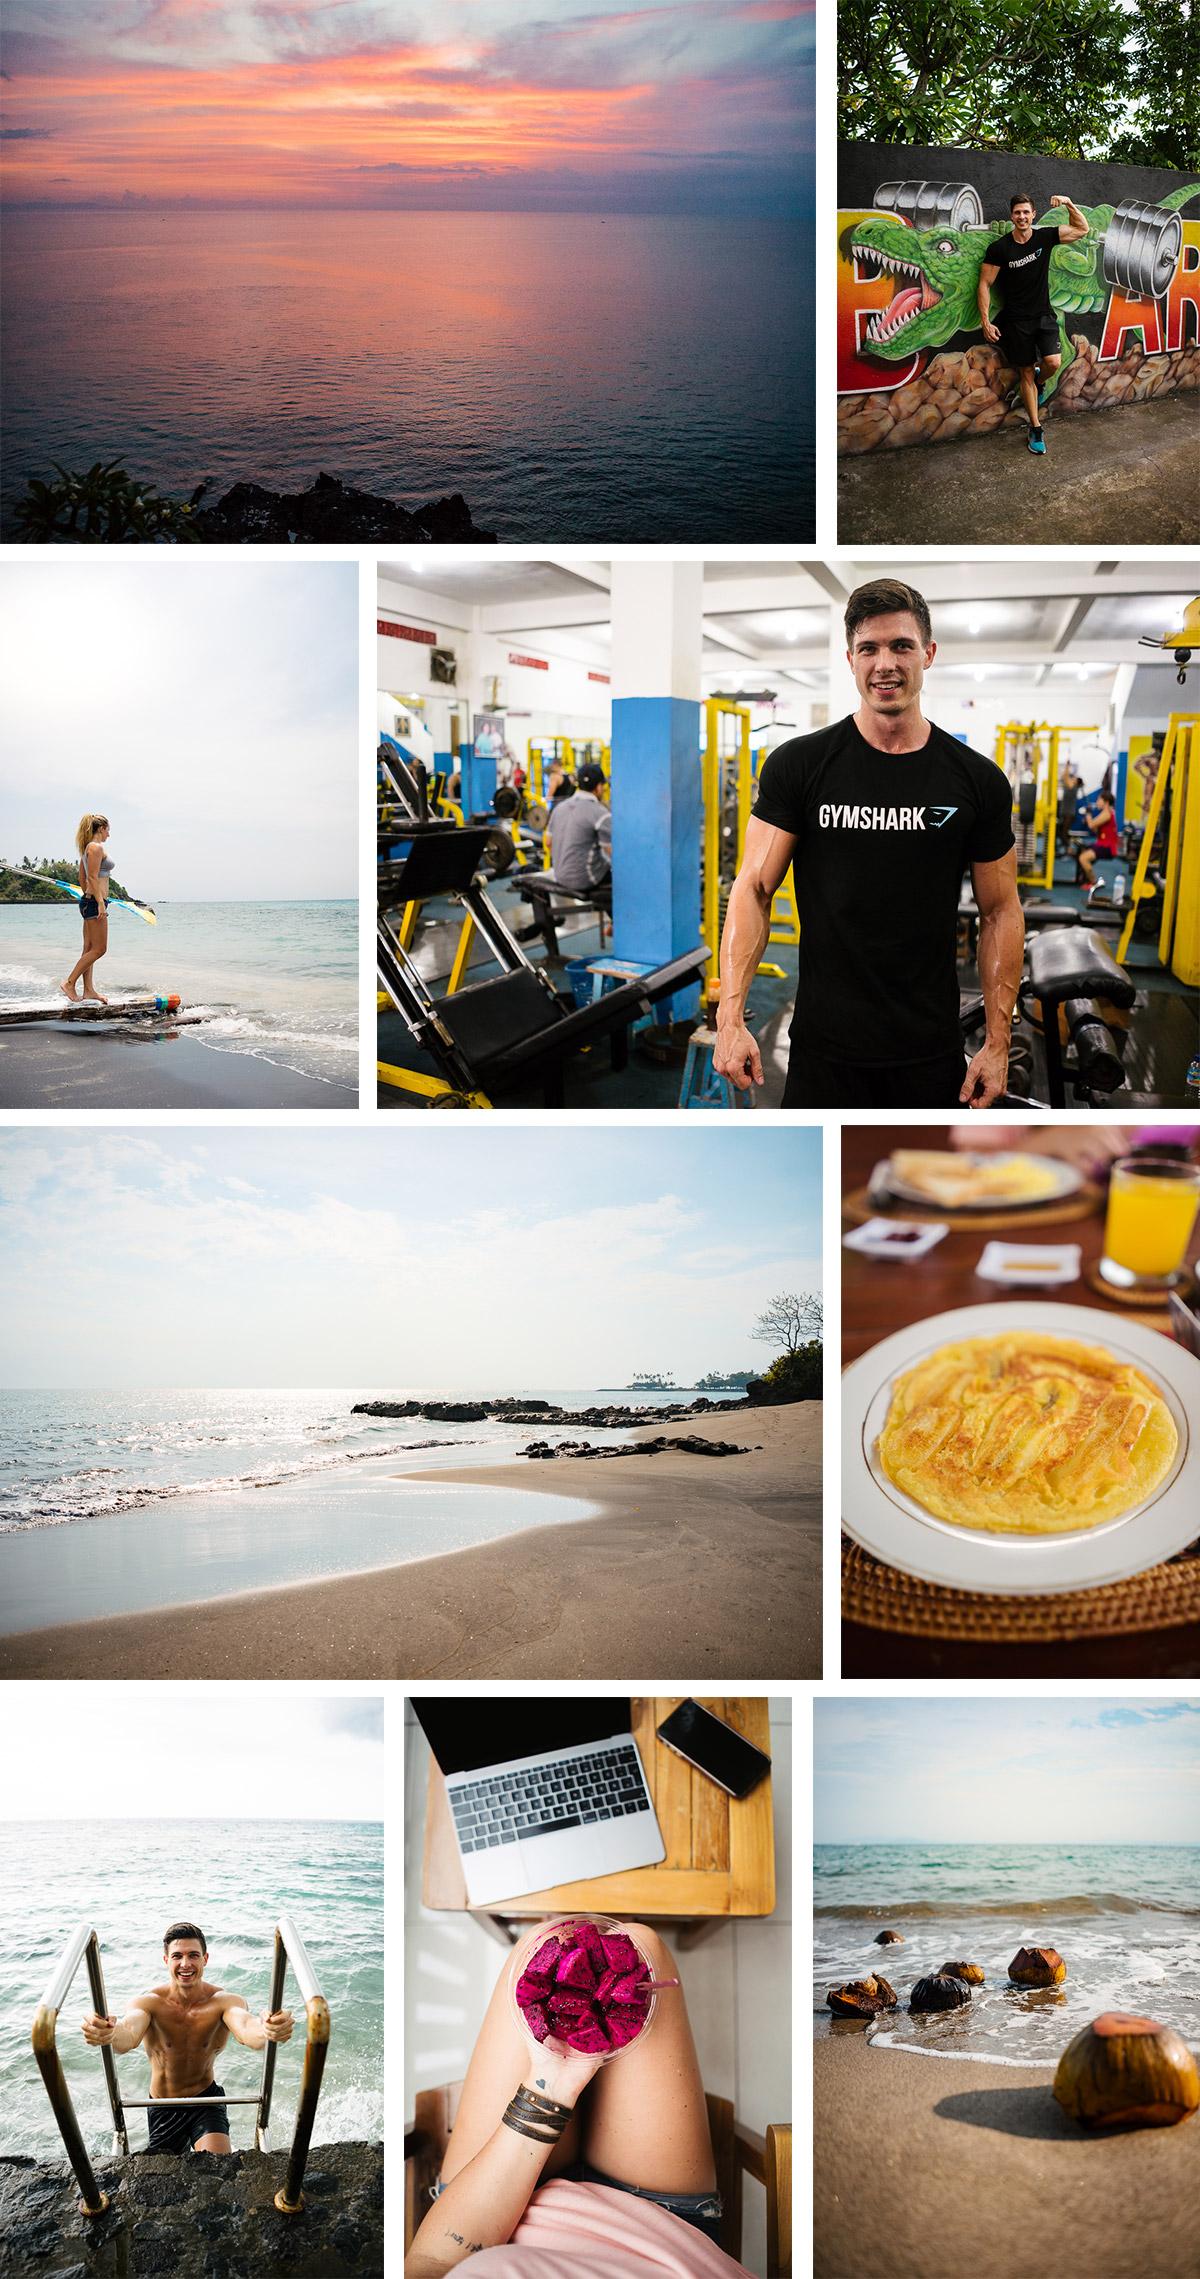 fitnessblog-fitnessblogger-fitness-blog-blogger-stuttgart-dreamteamfitness-unterkuenfte-auf-bali-lombok-semilir-senggigi